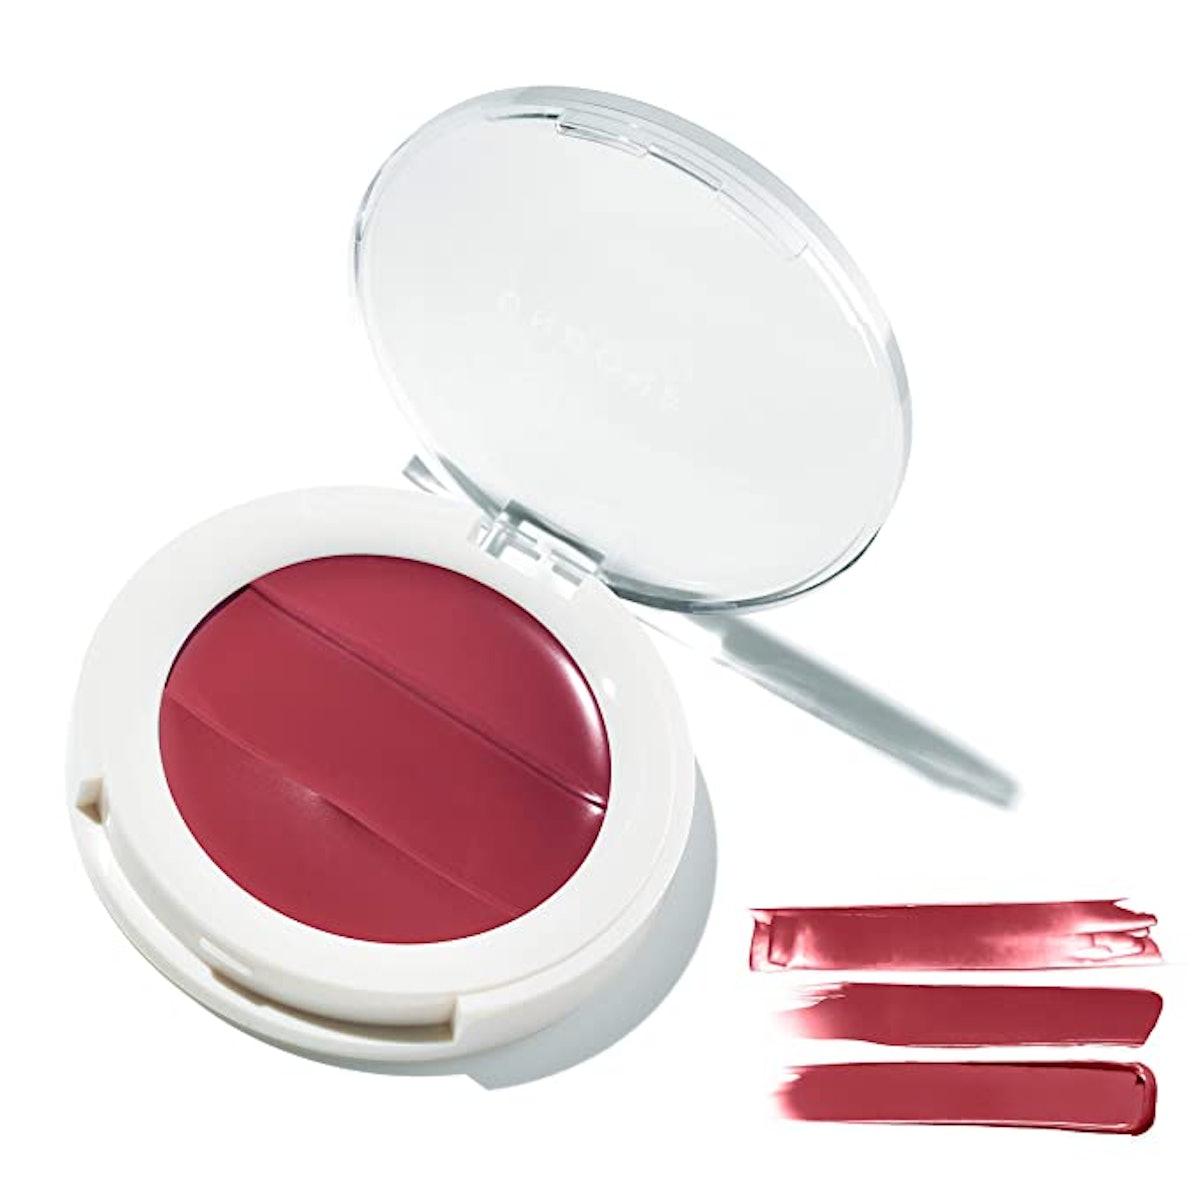 UNDONE BEAUTY  3-in-1 Lip + Cheek Cream